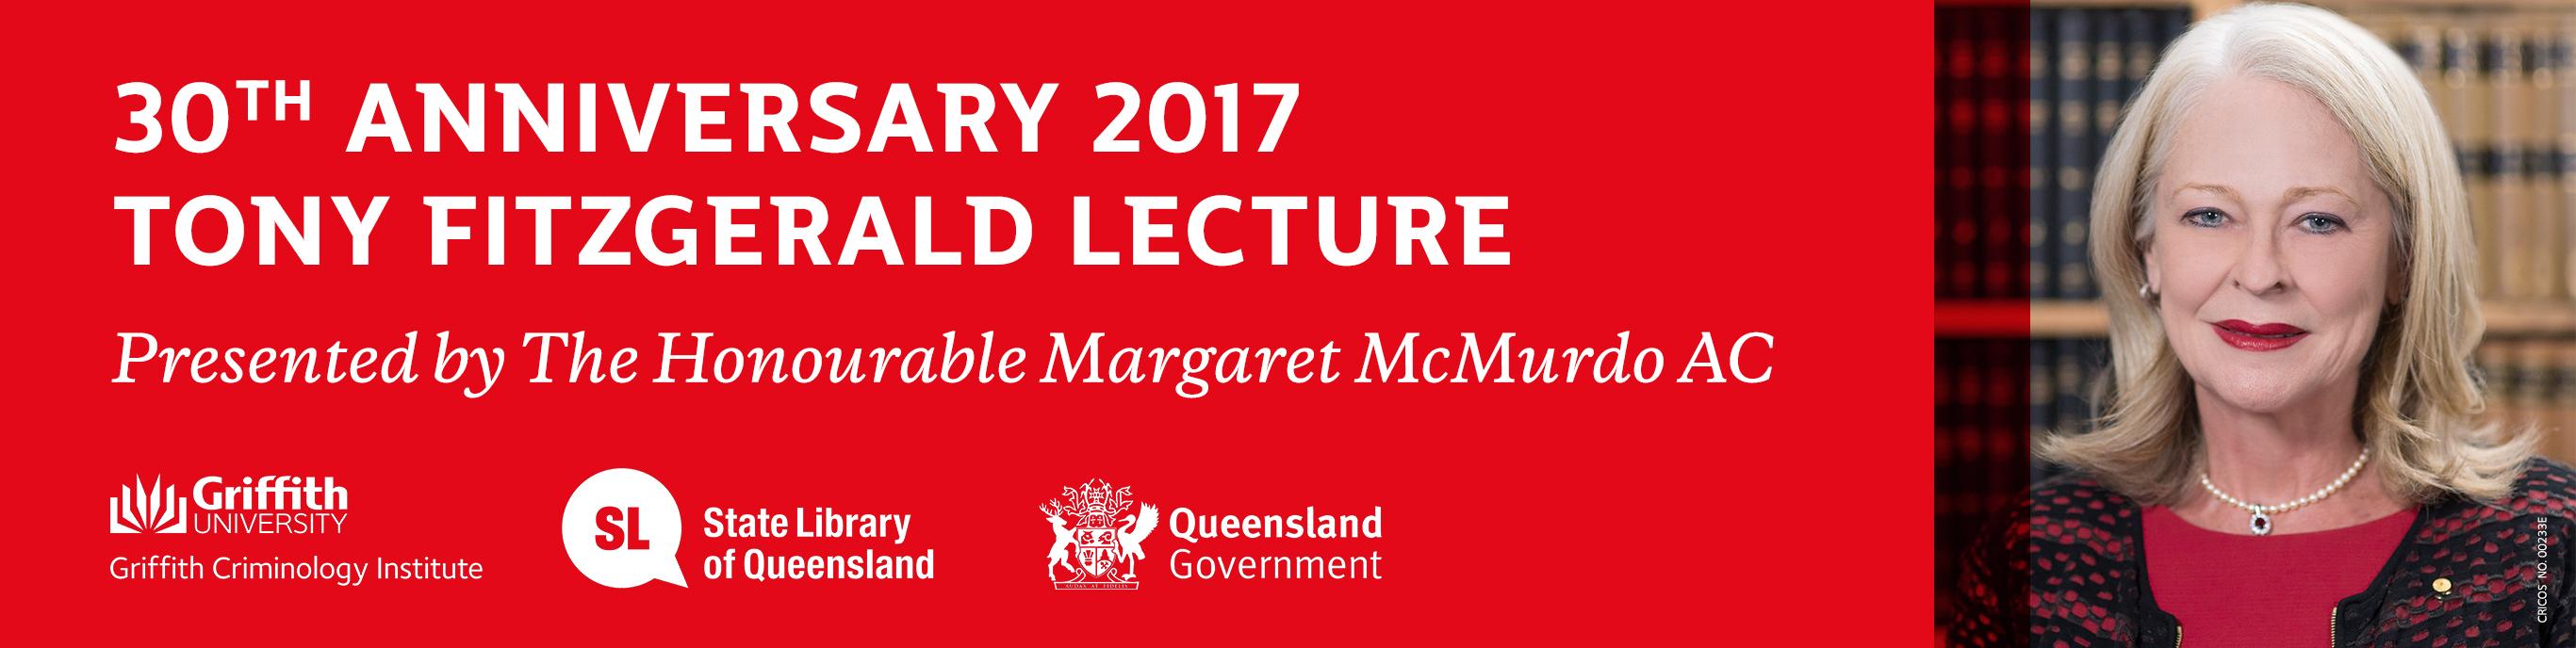 2017 Tony Fitzgerald Lecture